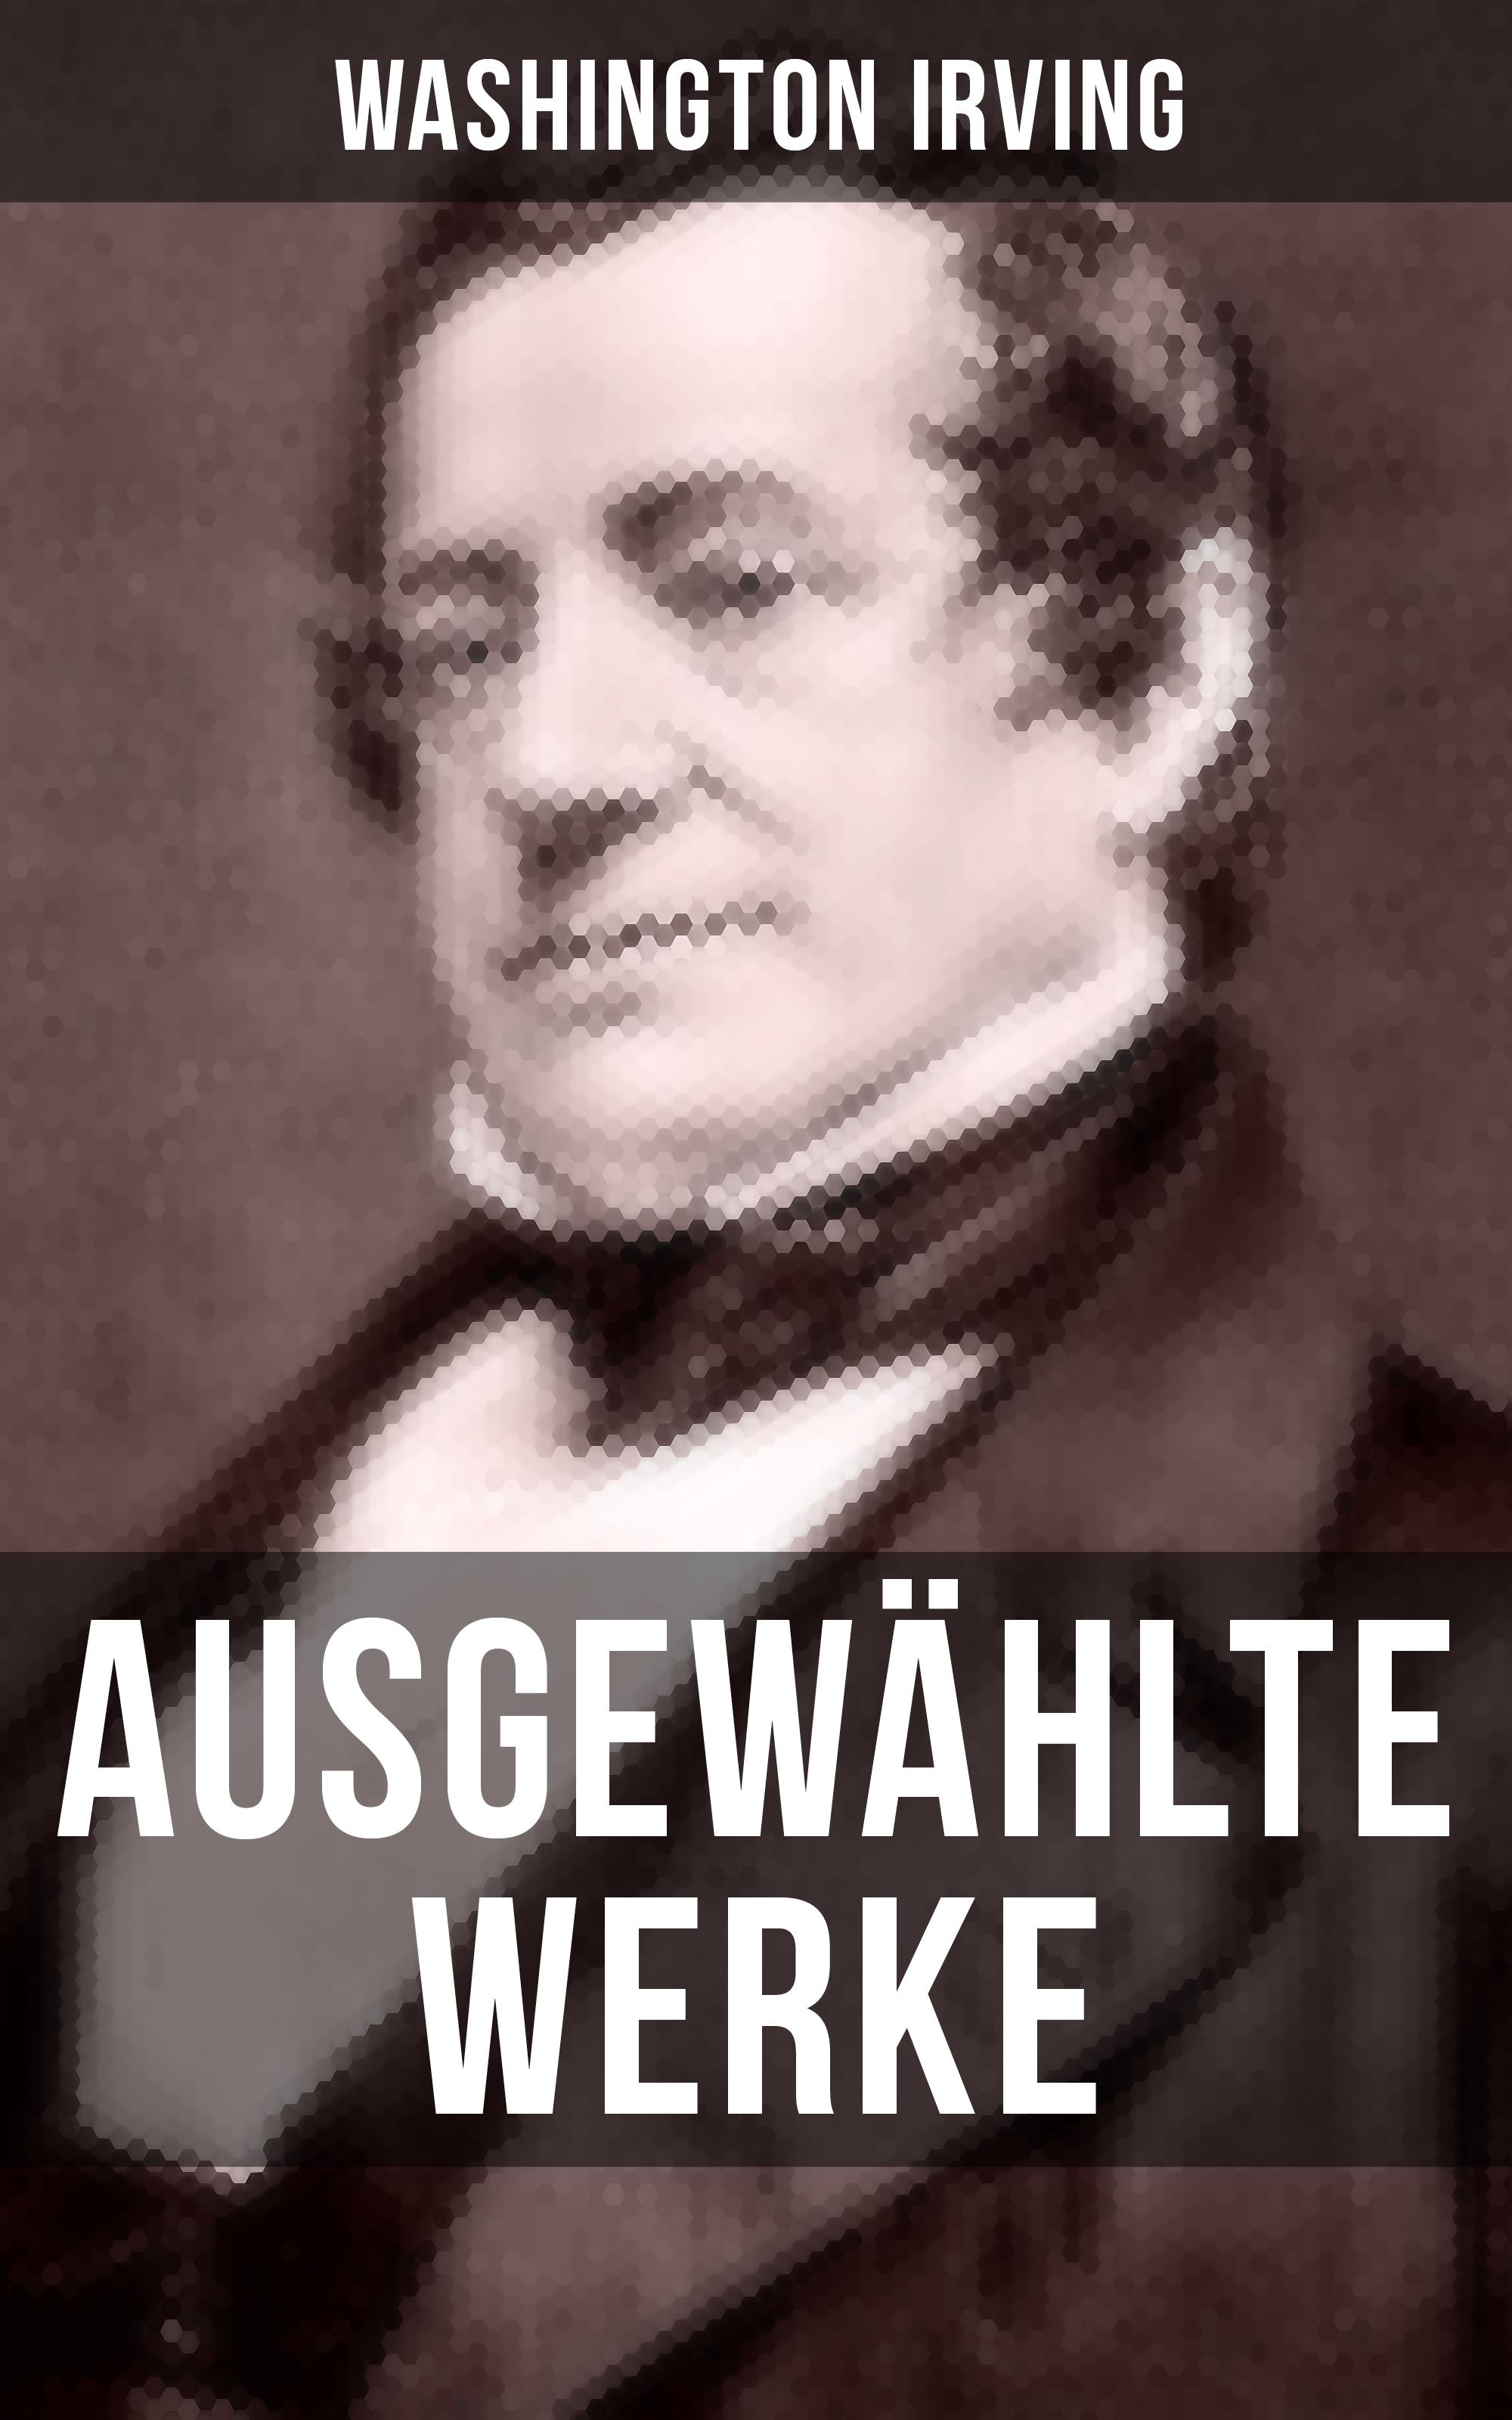 Вашингтон Ирвинг Ausgewählte Werke von Washington Irving washington irving wolfert s roost and miscellanies